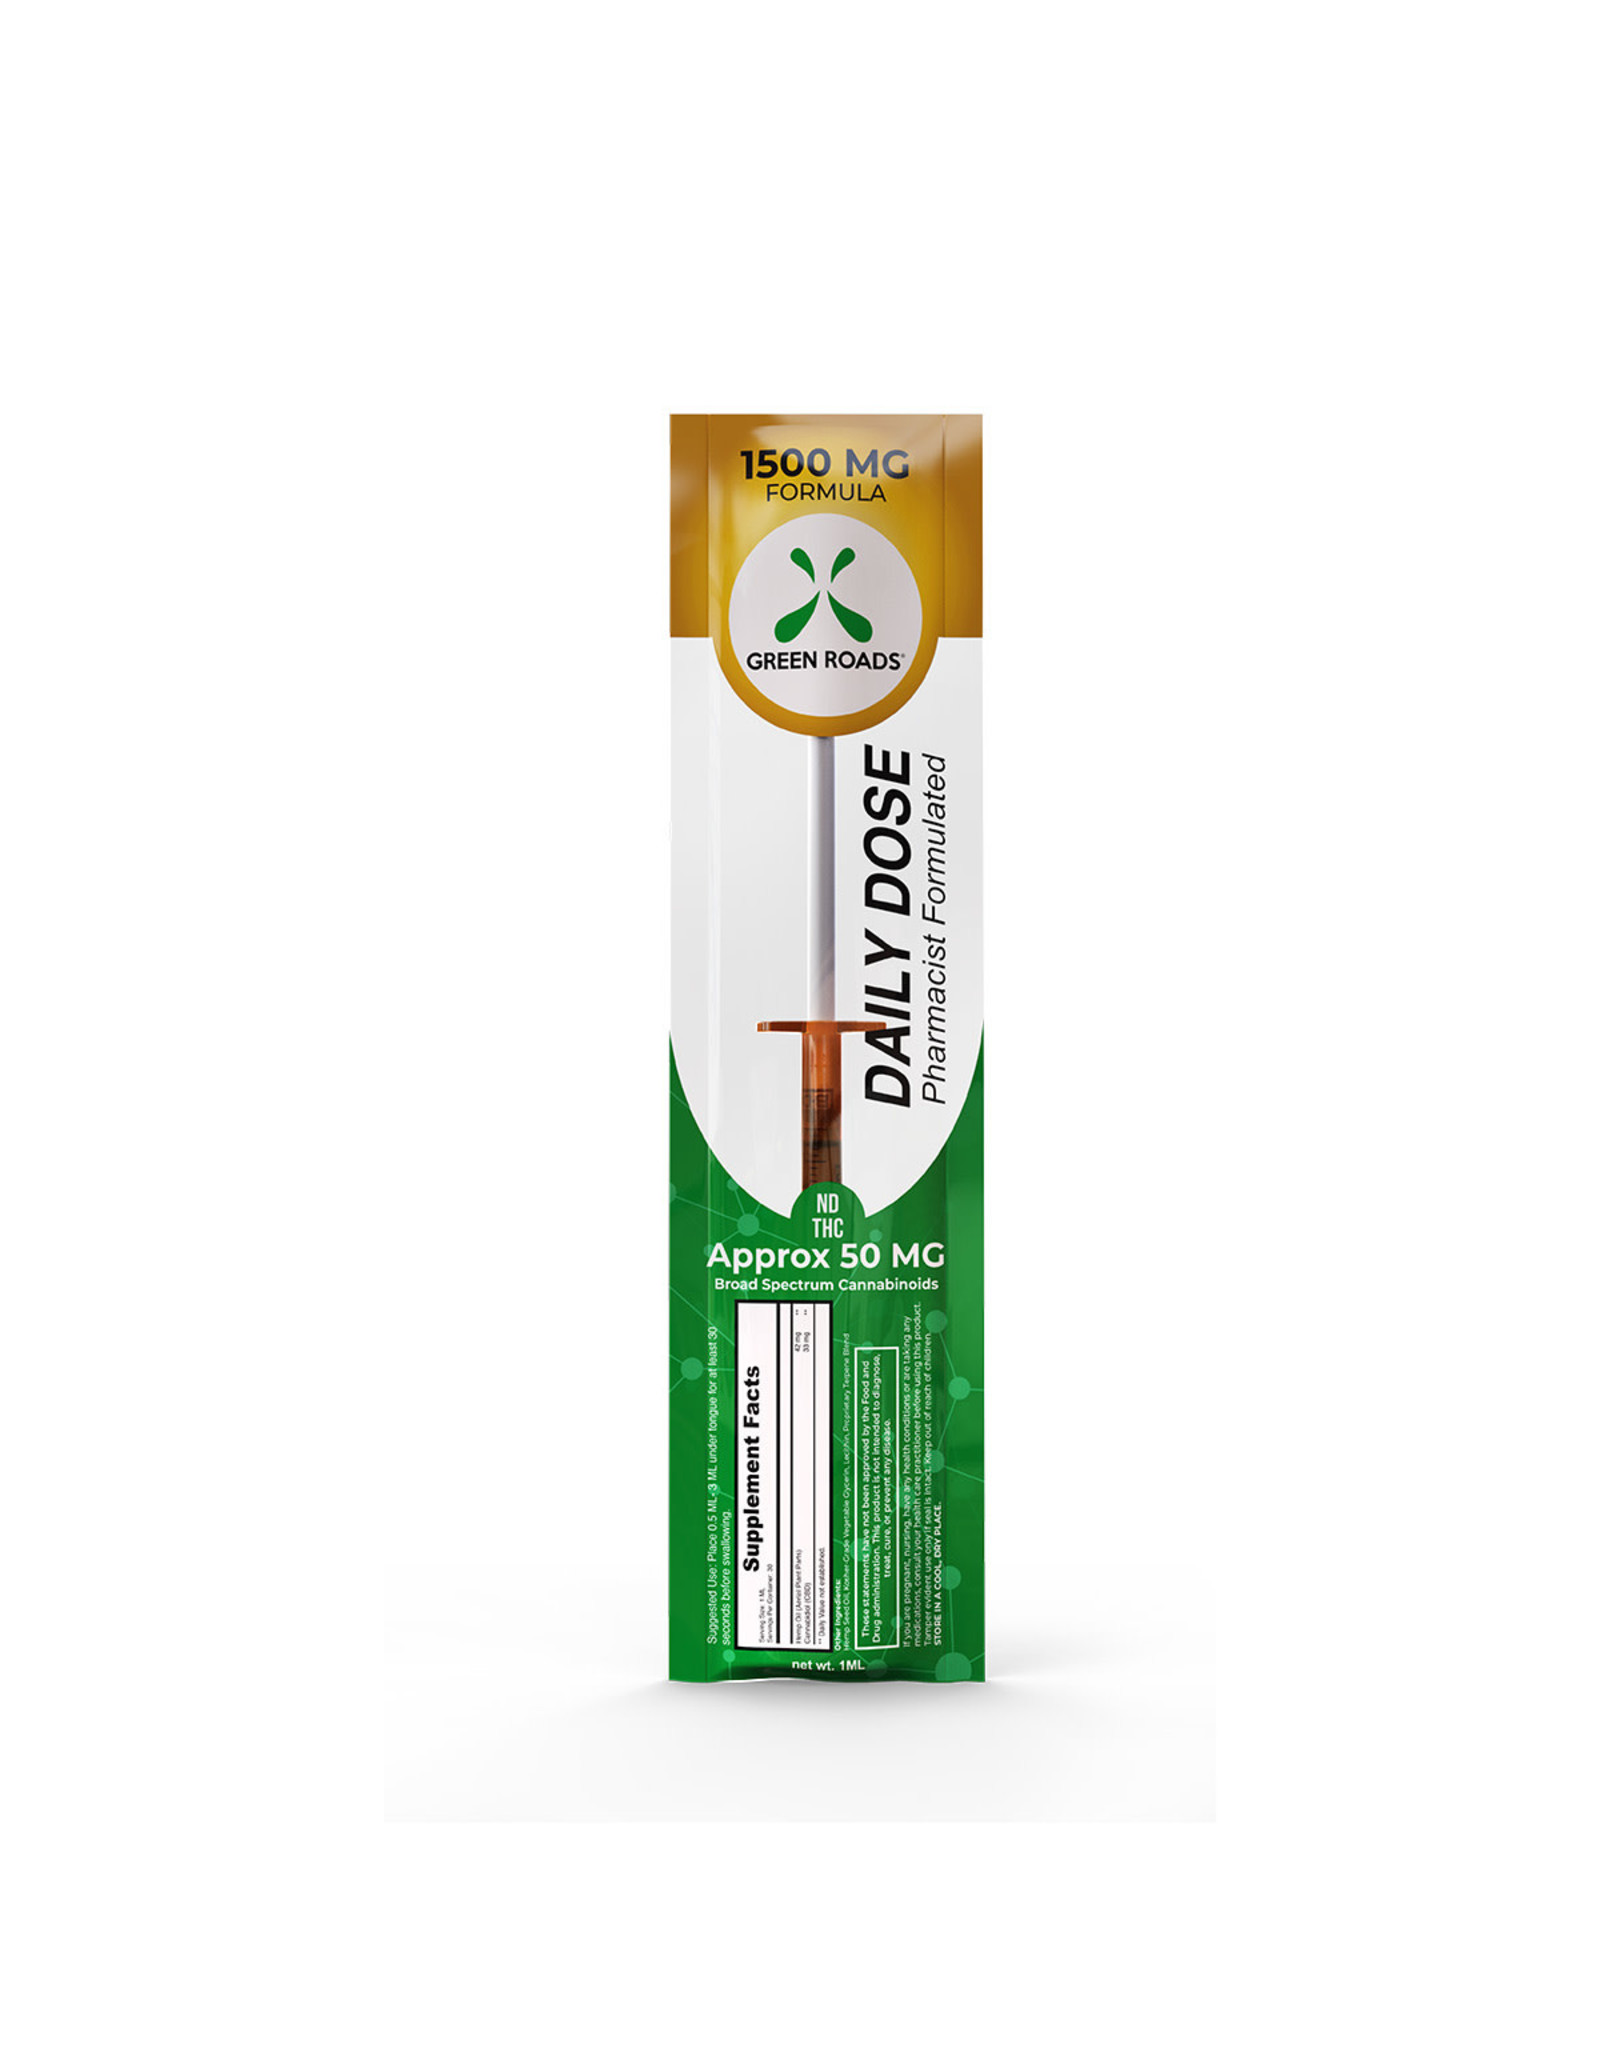 Green Roads 1500 MG Formula Daily Dose Syringe